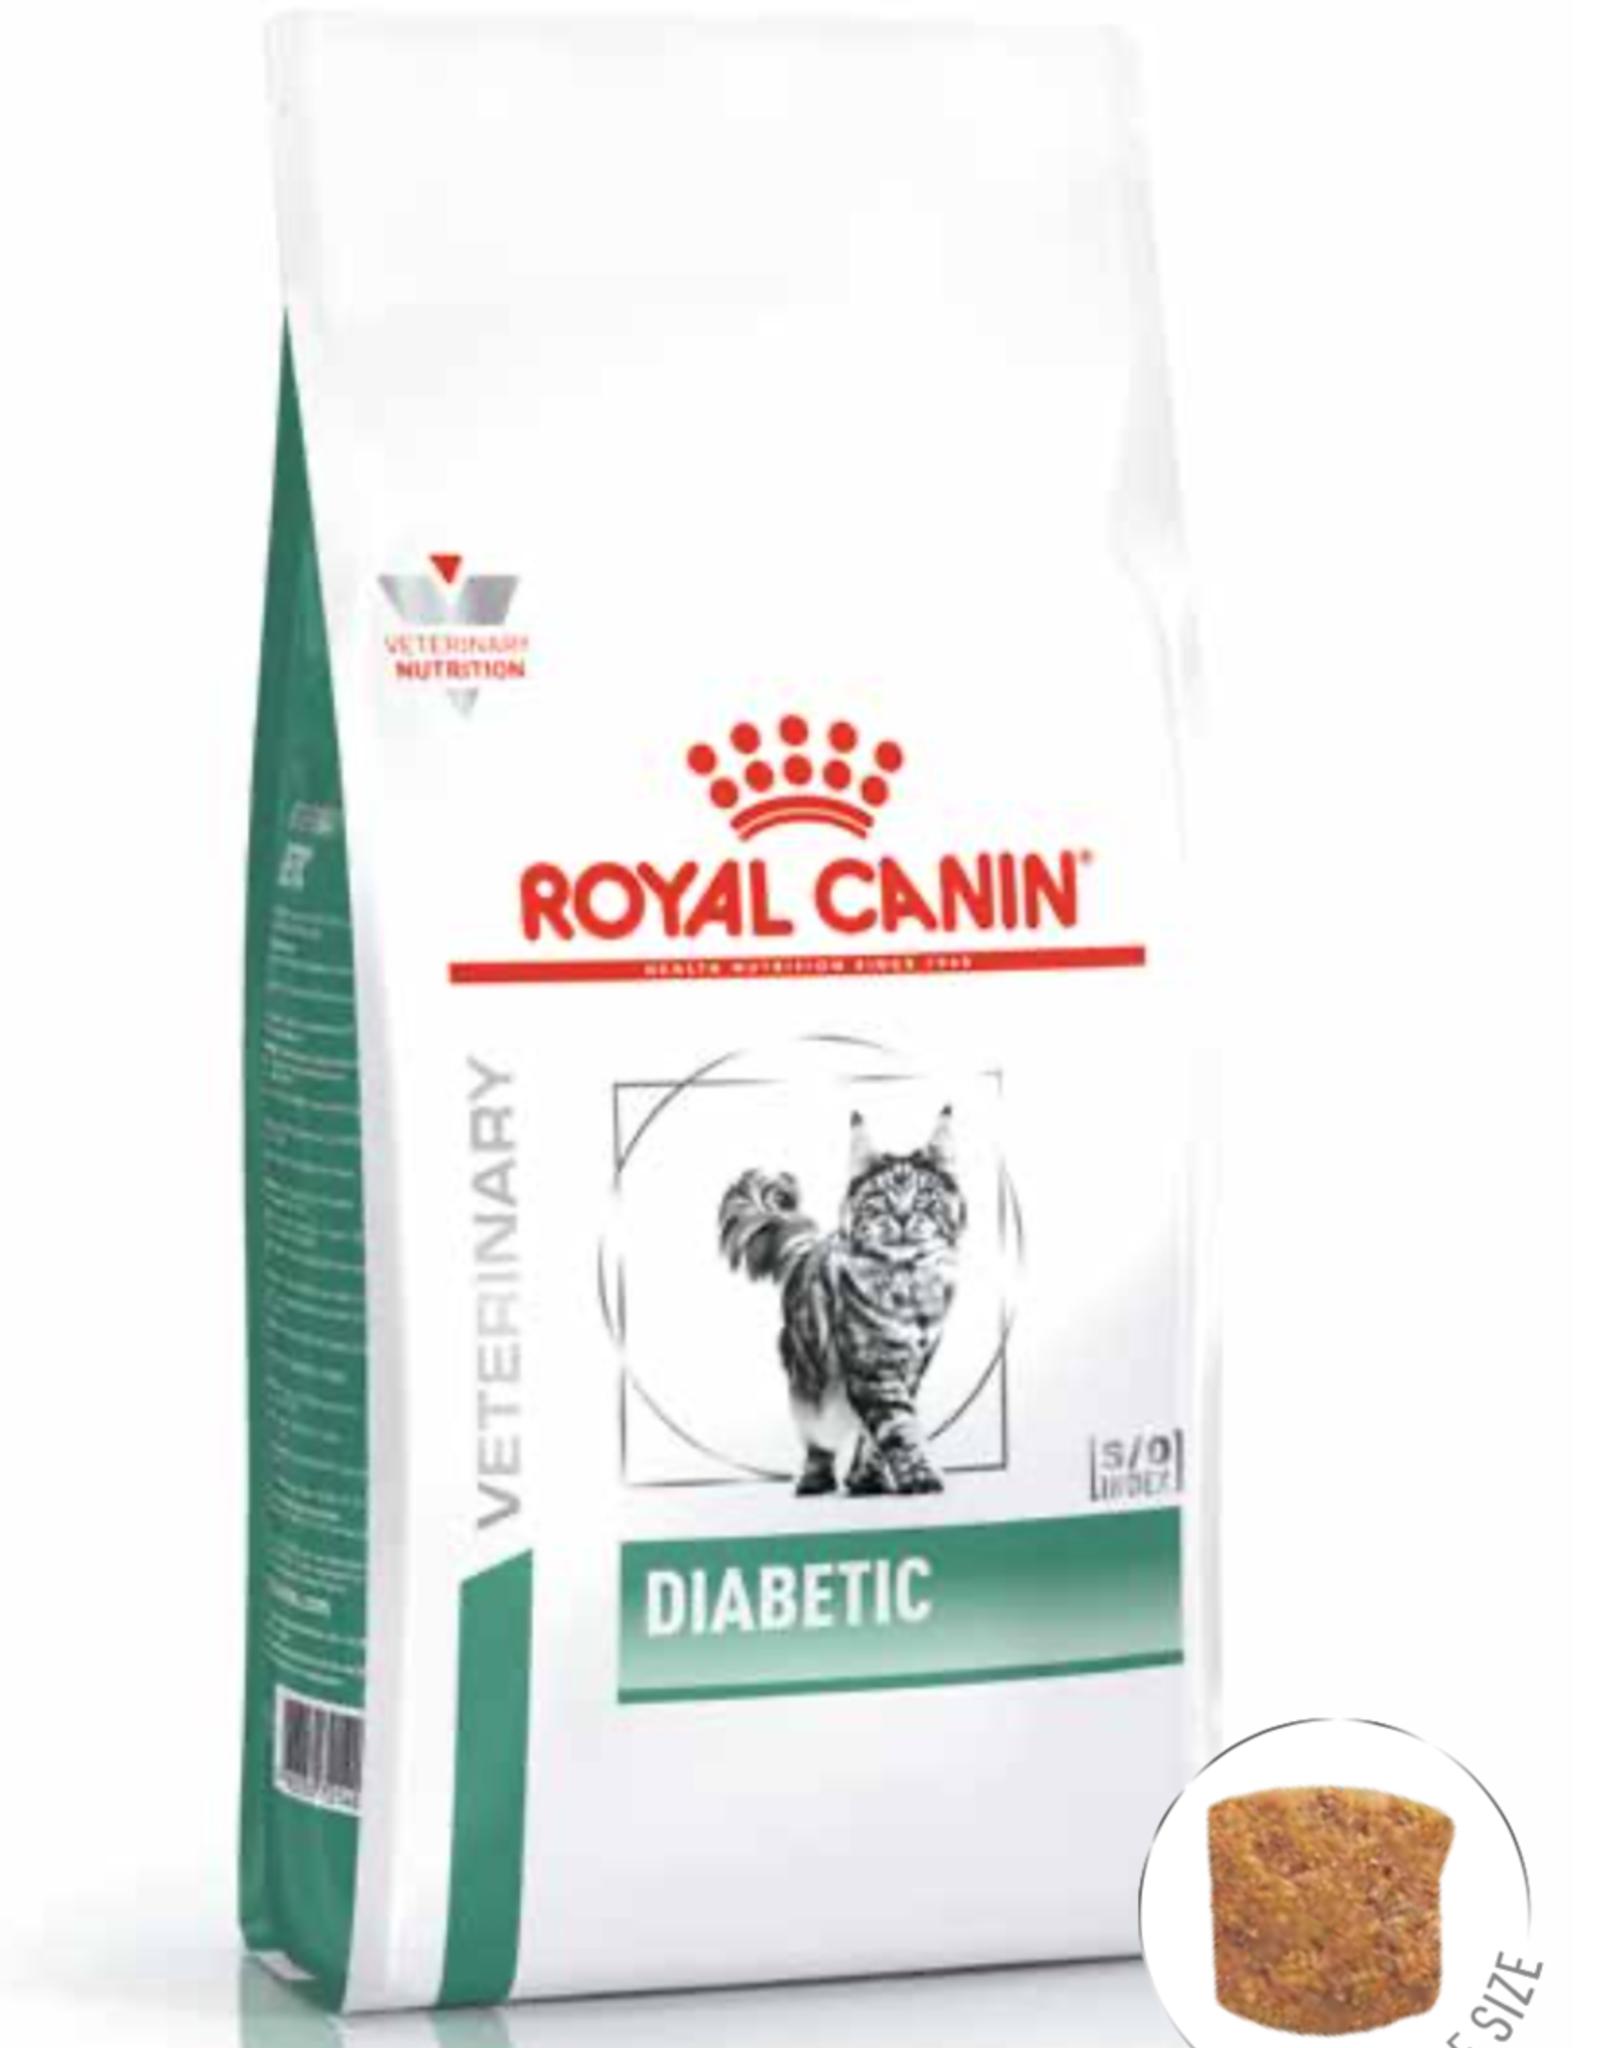 Royal Canin Royal Canin Vdiet Diabetic Feline 1,5kg